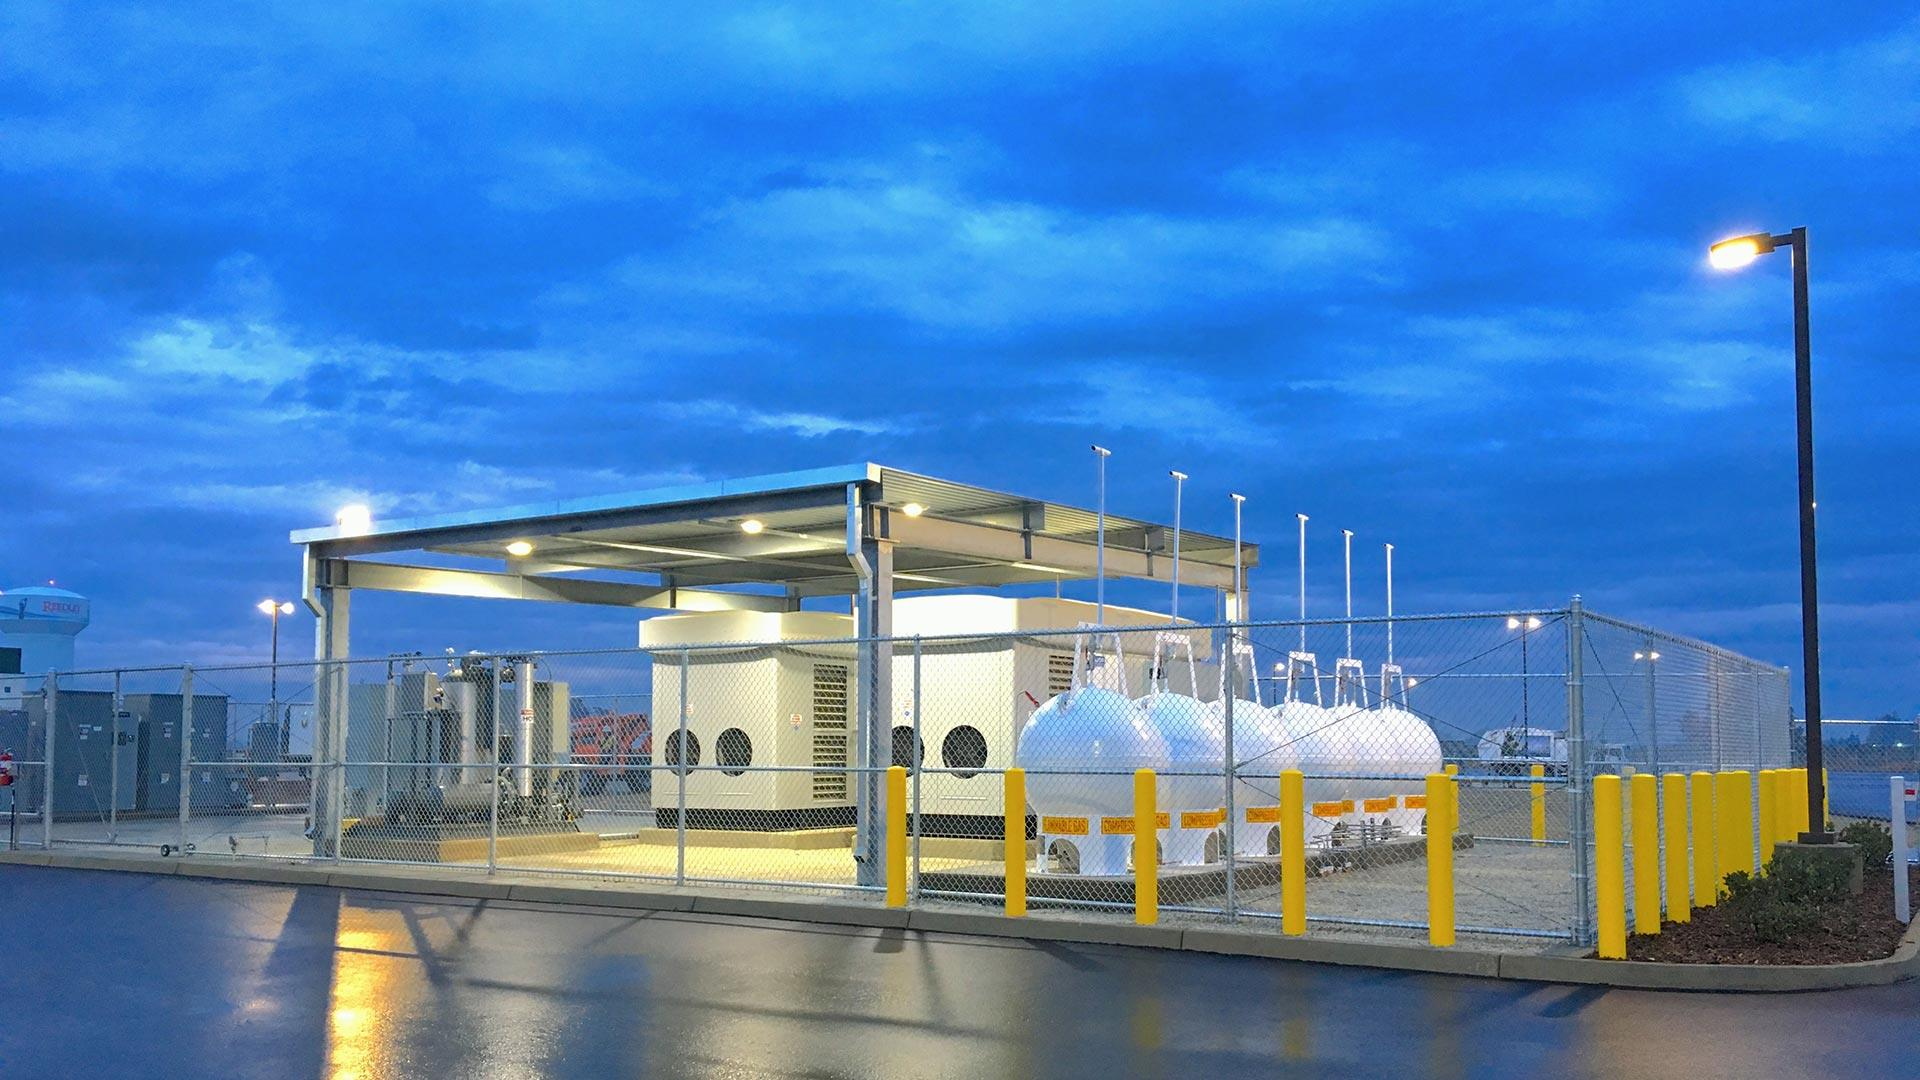 CNG Spheres at Station